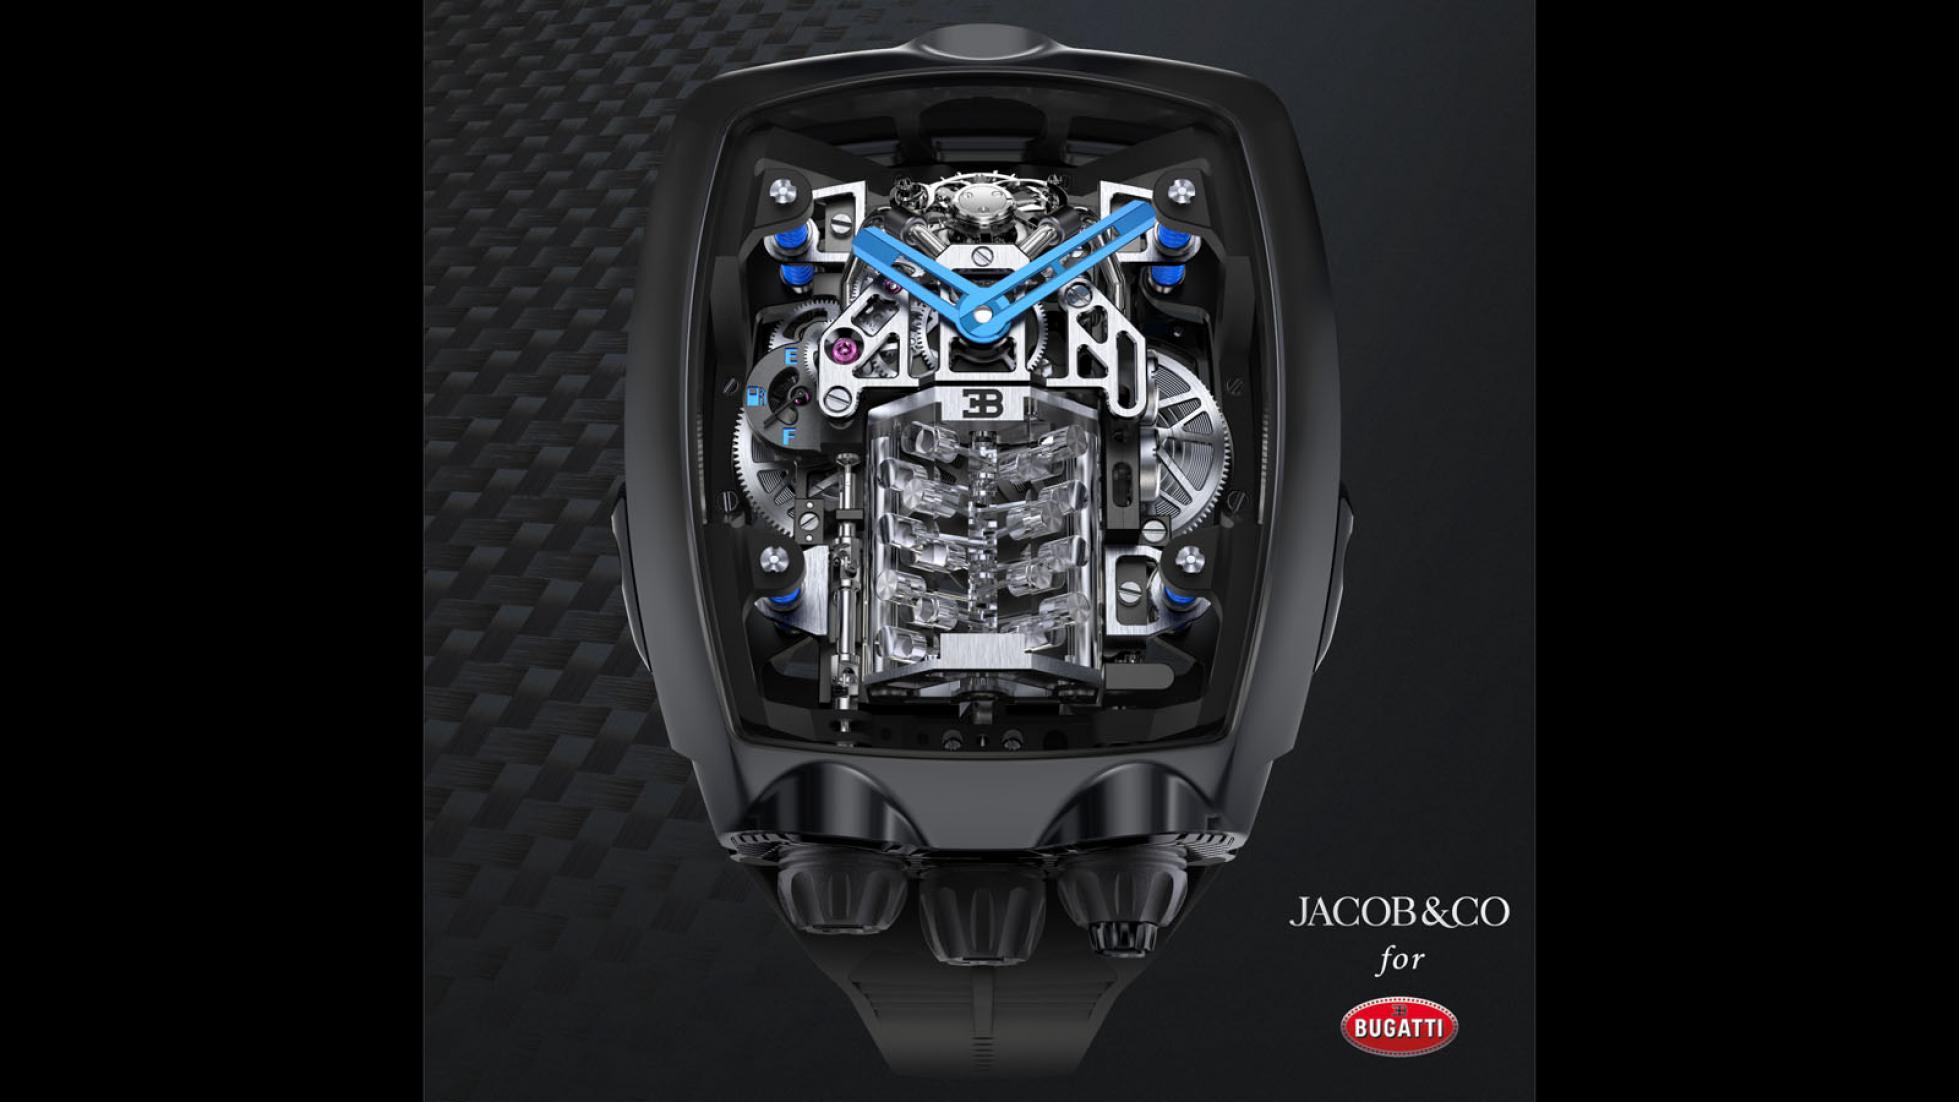 1_Jacob-Co-Bugatti-Chiron-Tourbillon-4